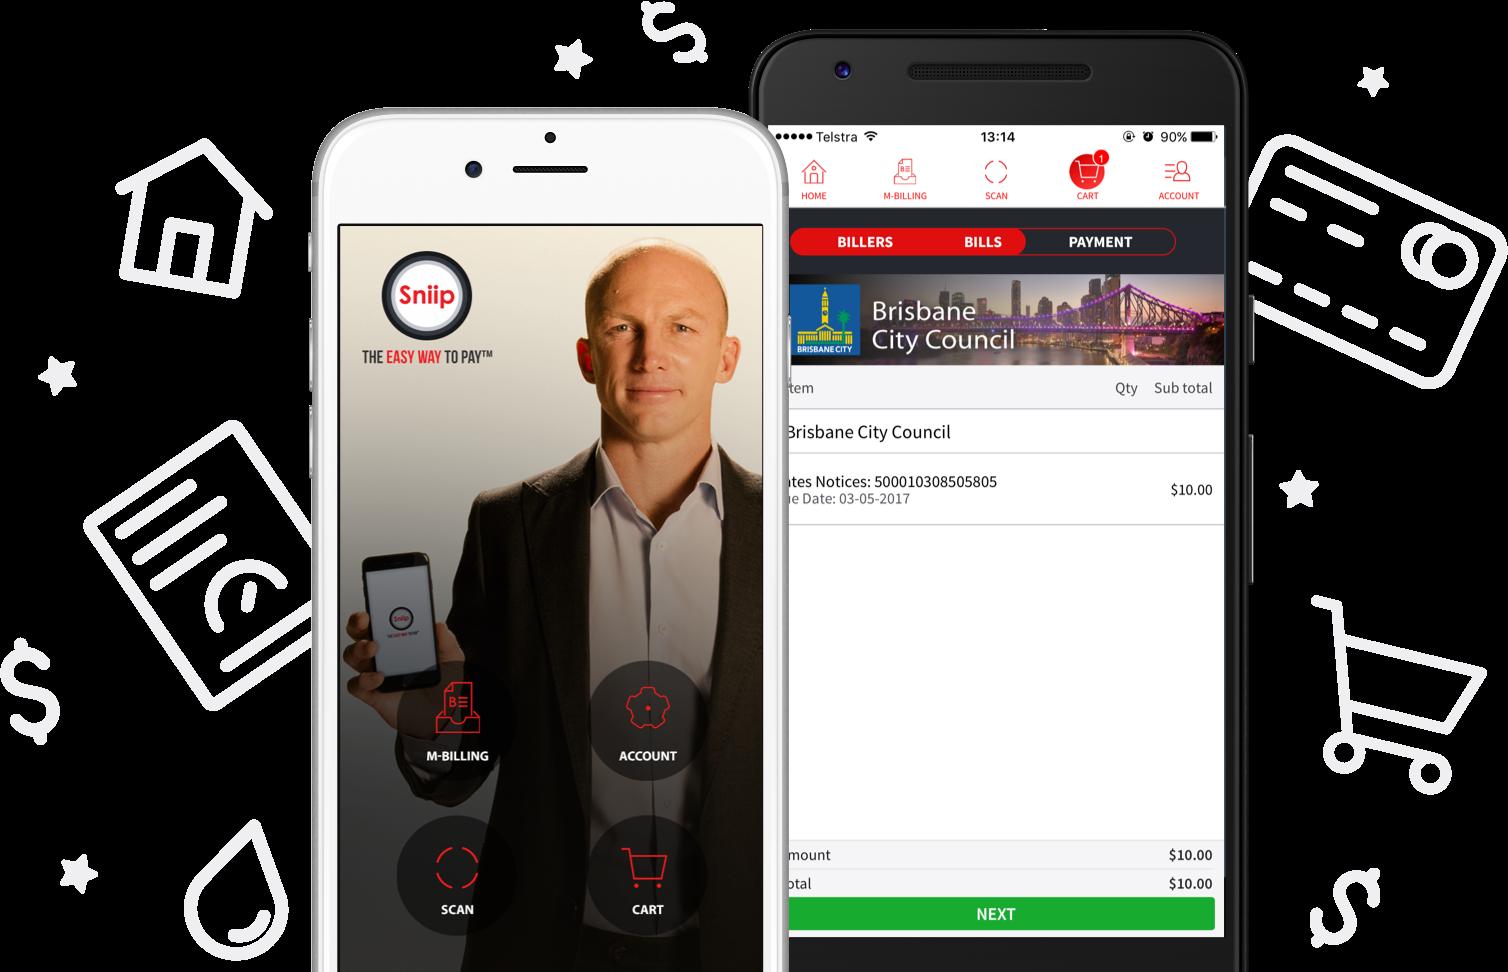 Sniip App mobile